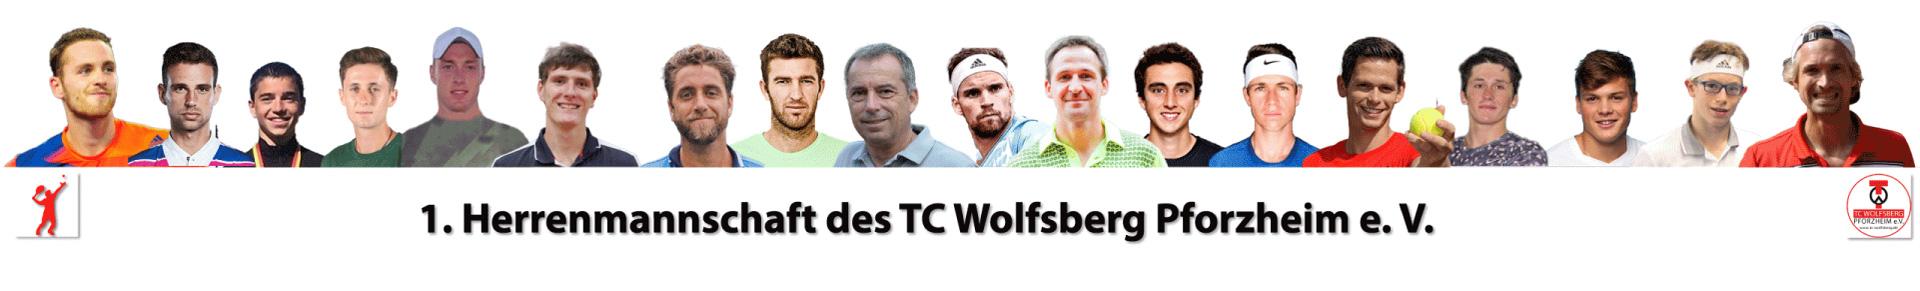 Tennis-Herrenmannschaft-TC-Wolfsberg-Pforzheim-Bundesliga-Mannschaft-2021